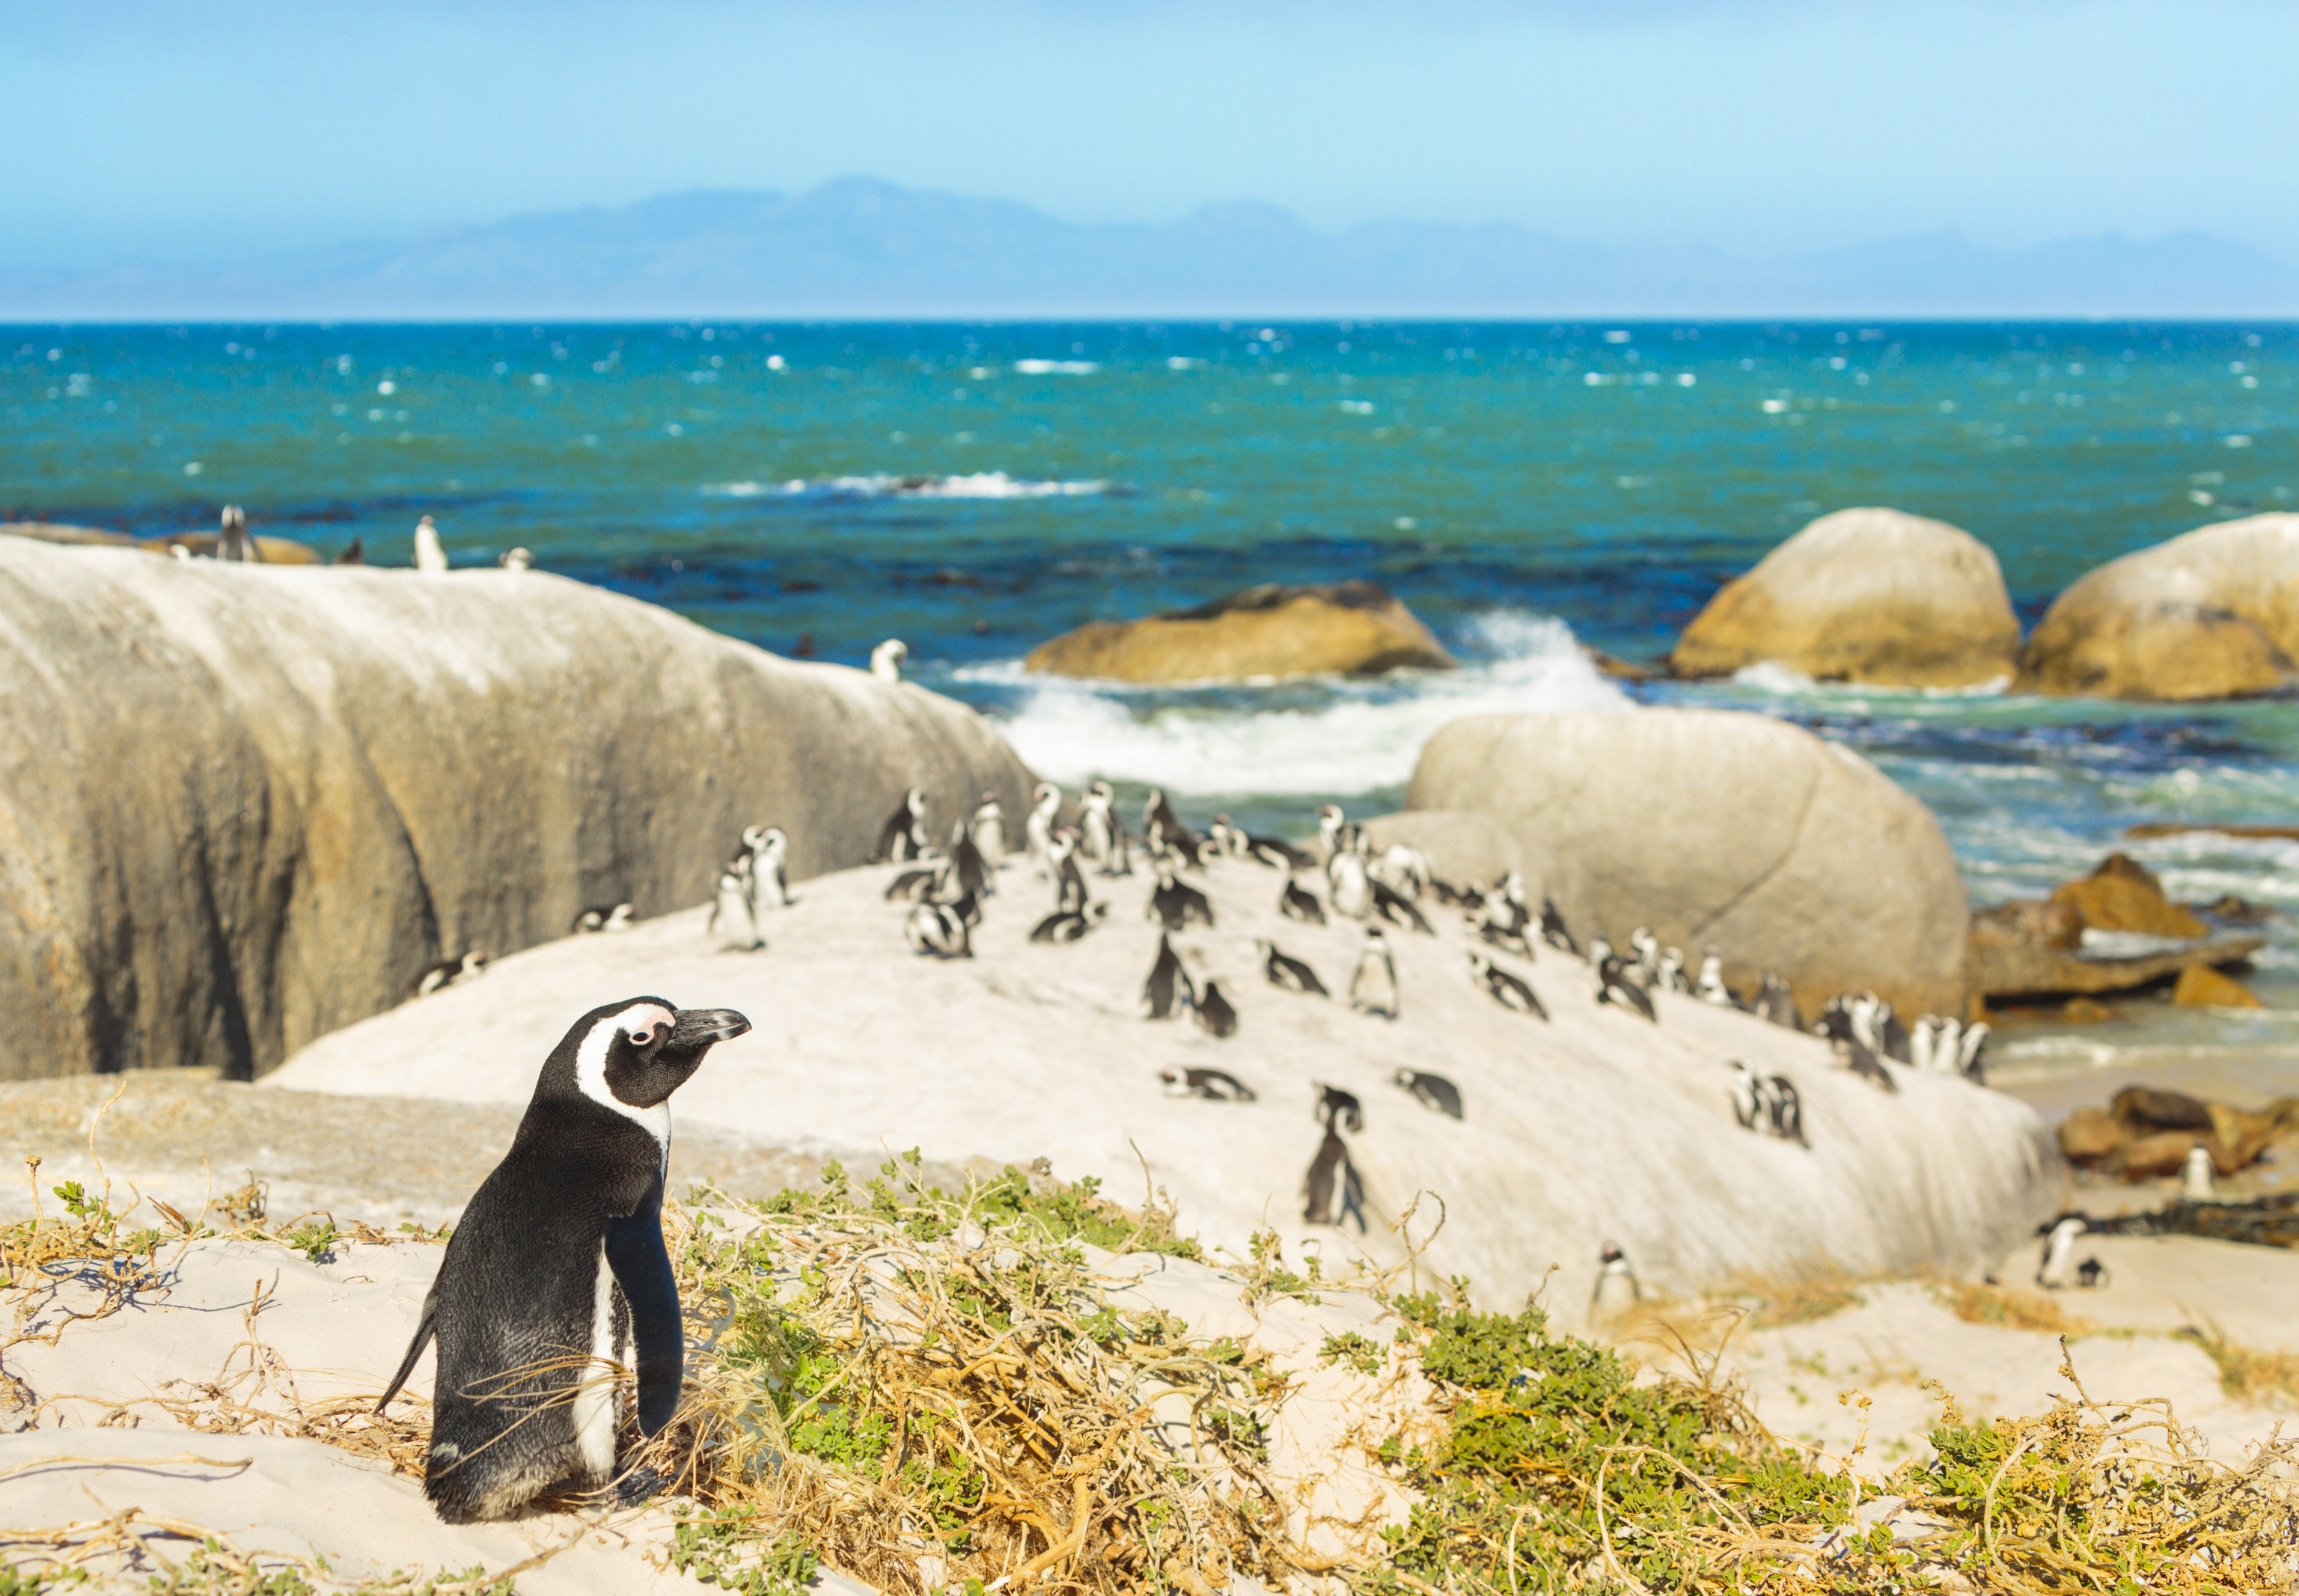 outdoor sky grass animal penguin flightless bird fauna shore Bird Sea Ocean Coast aquatic bird Beach cape vacation coastal and oceanic landforms tourism sand